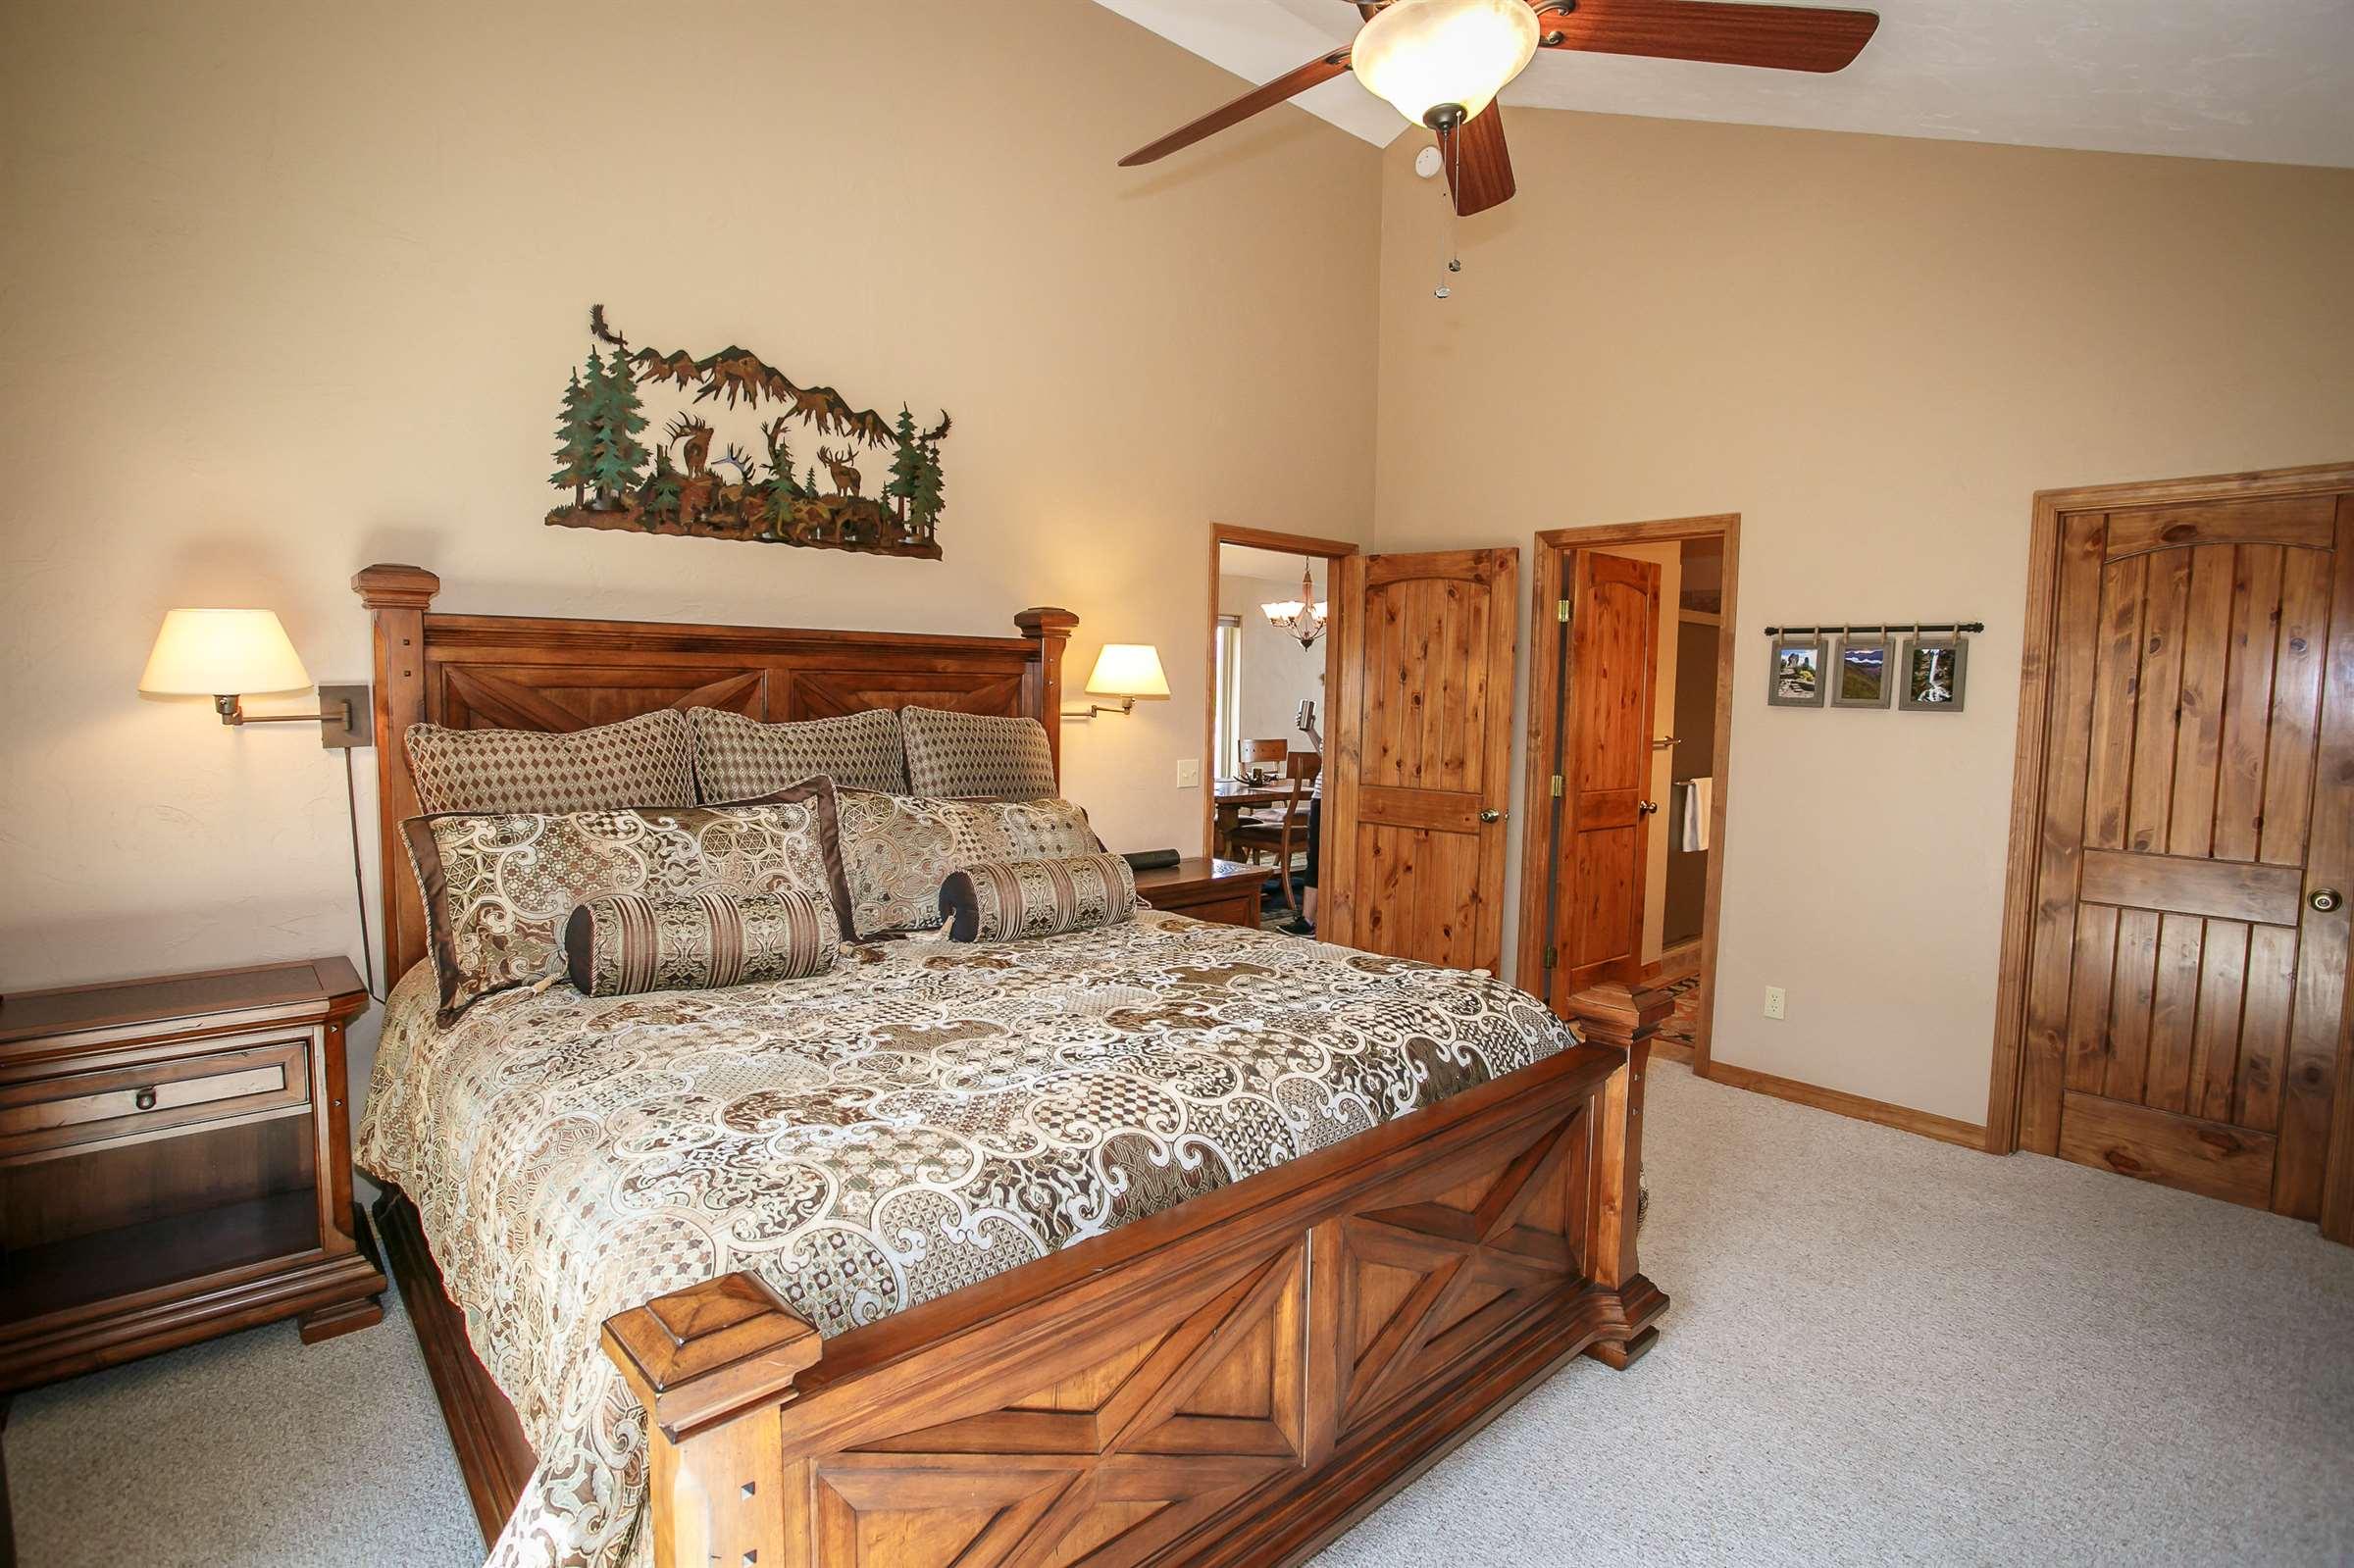 1135 Park Ave #204, #Short Term, Pagosa Springs, CO 81147